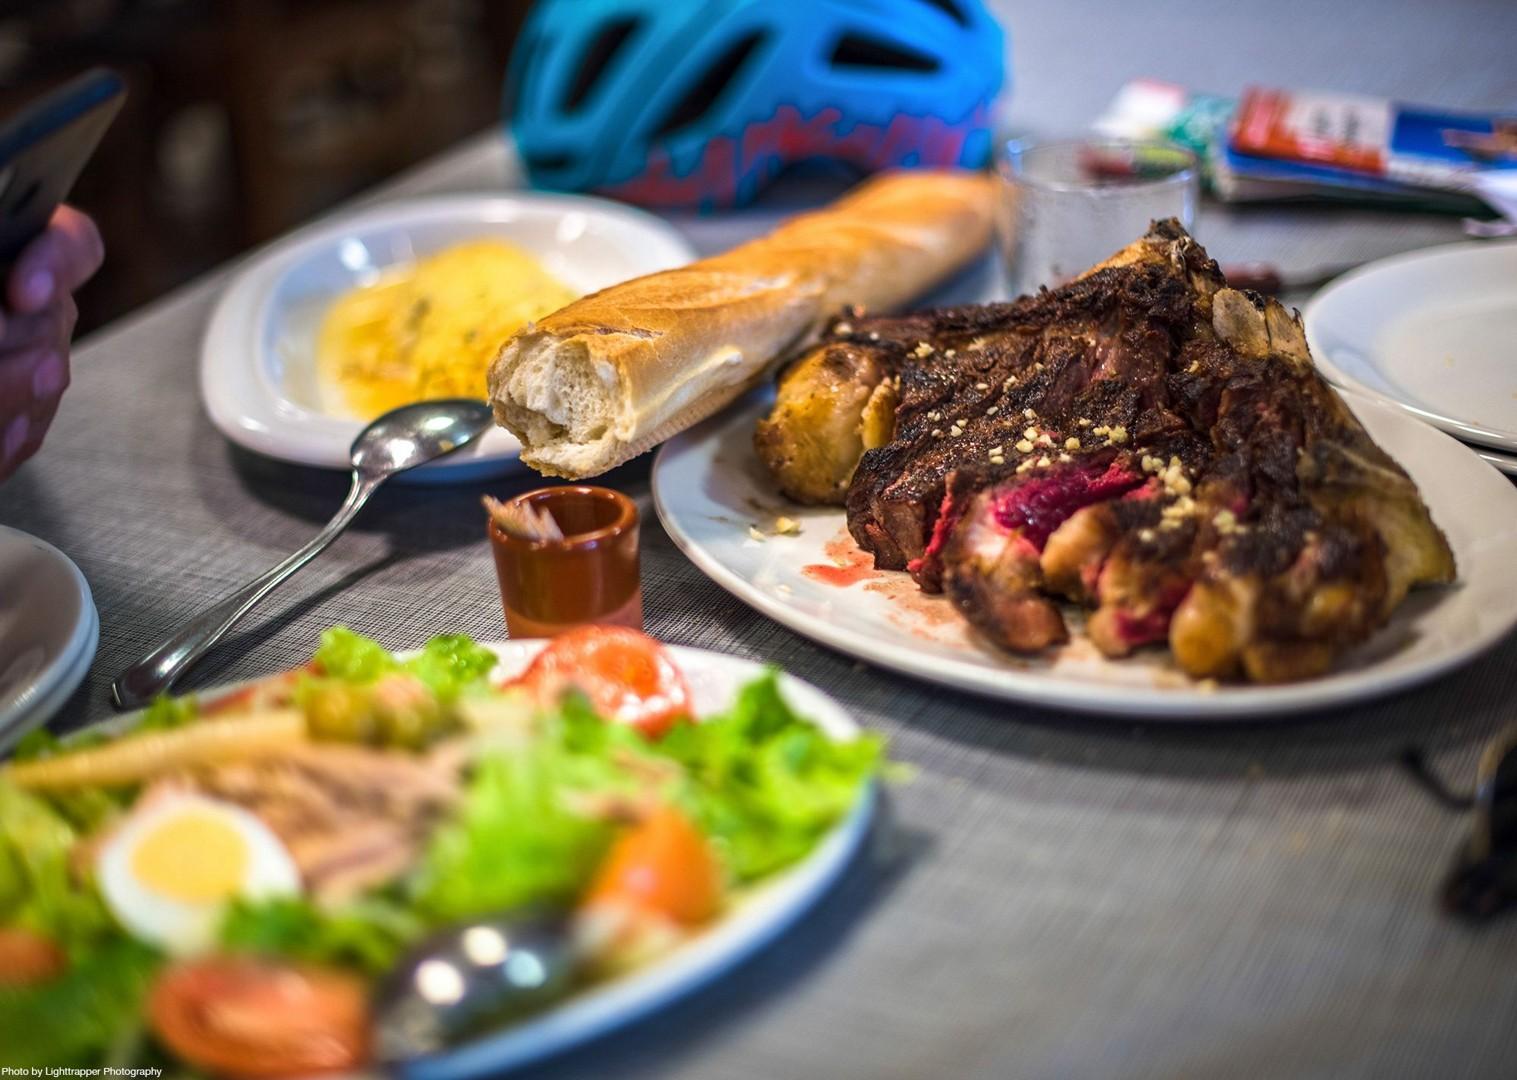 spanish-cuisine-spain-food-leisure-cycling-holiday-bilbao.jpg - NEW! Spain - Bilbao to San Sebastian - Leisure Cycling